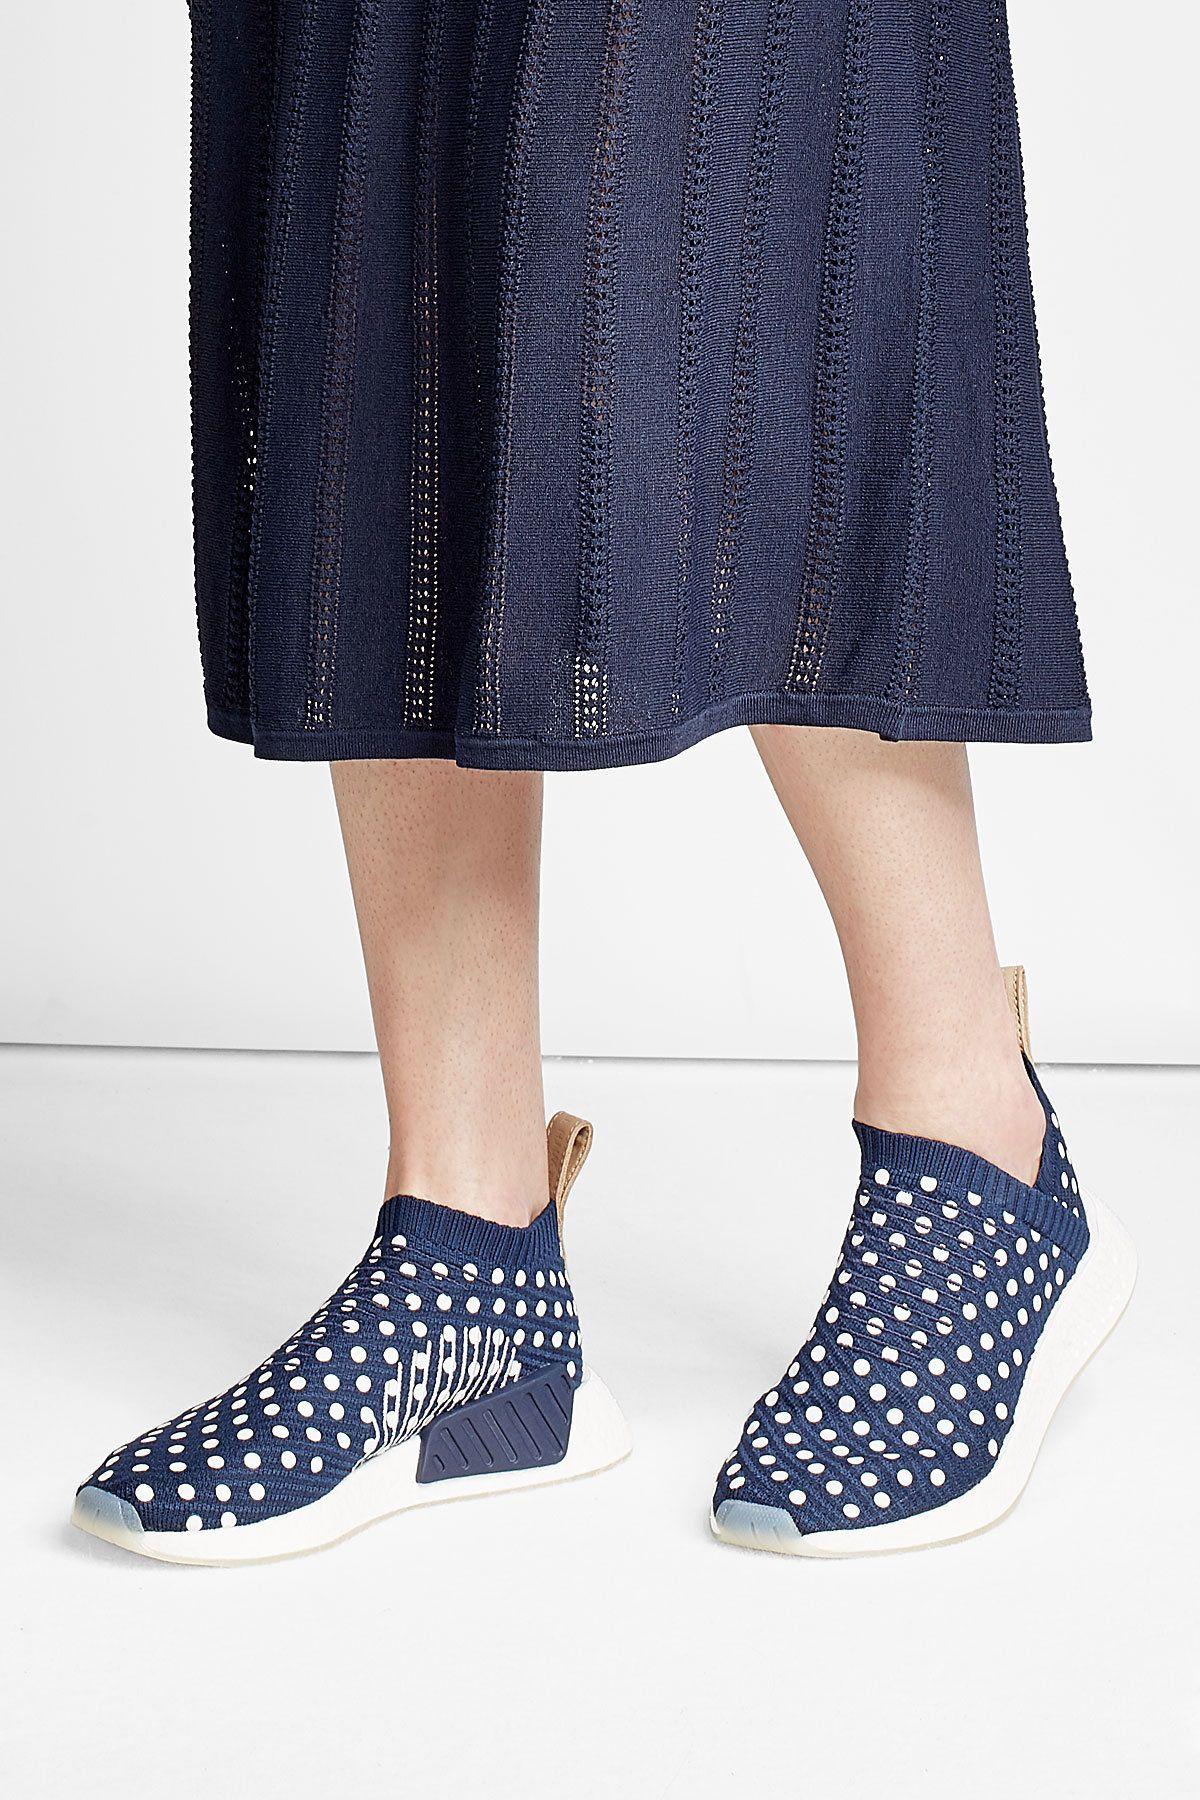 9109fec30 Wow...Adidas originals nmd cs2 sock sneakers multicolored women ...